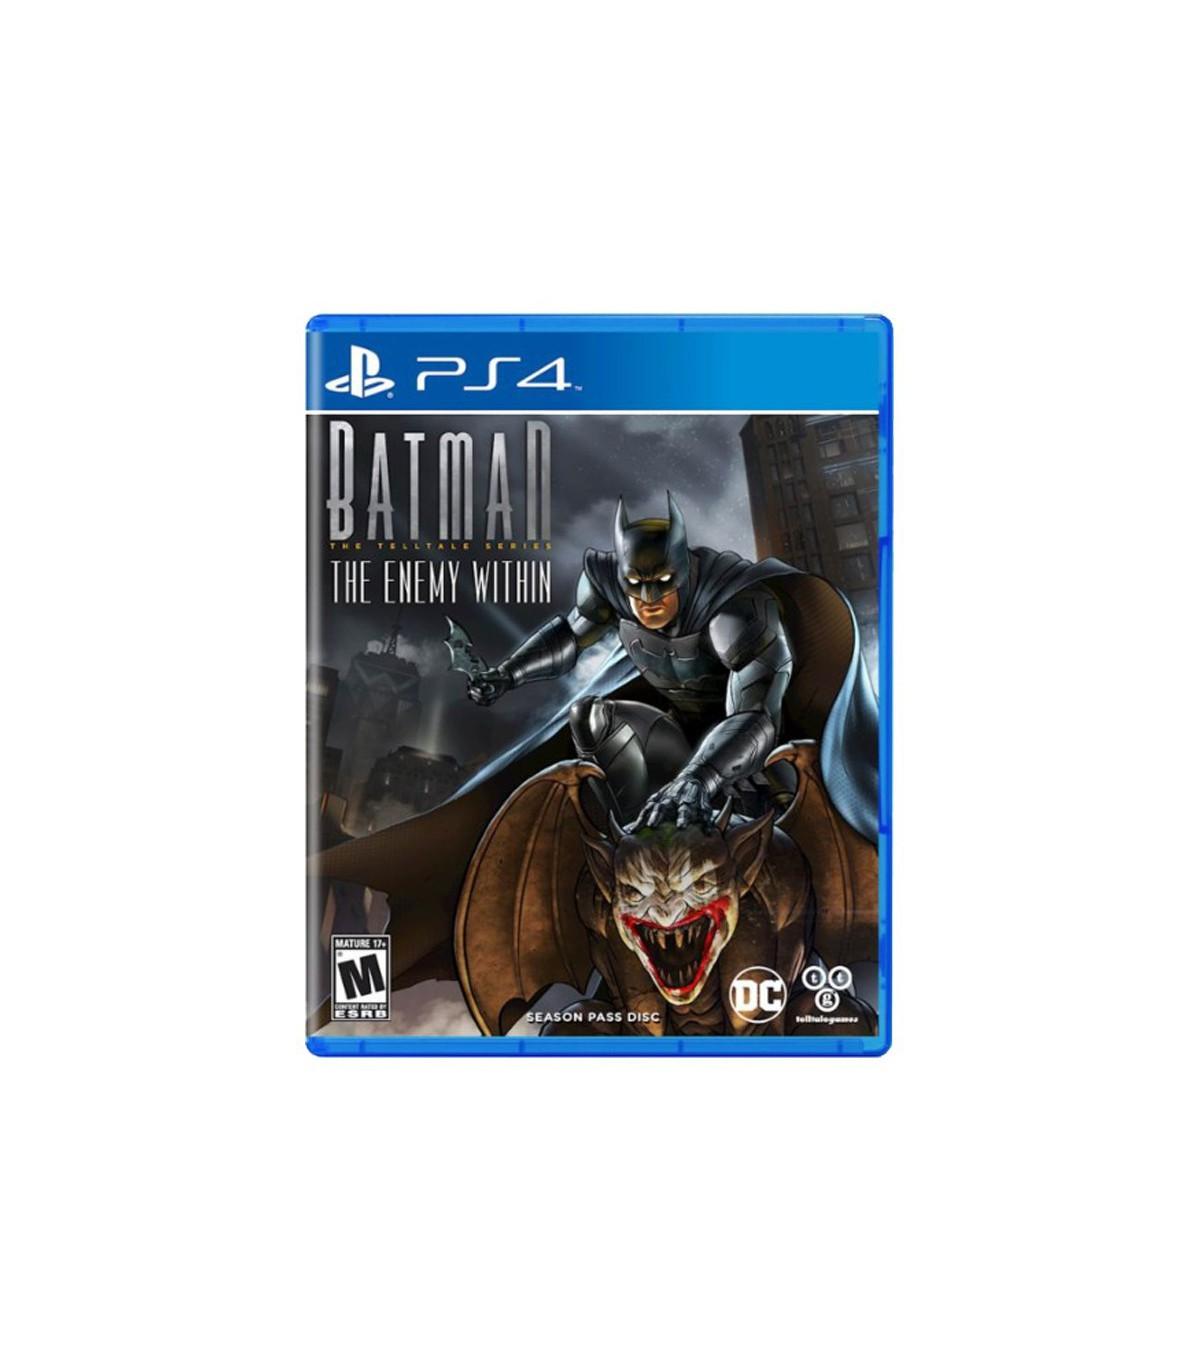 بازی Batman: The Enemy Within - Telltale Series کارکرده - پلی استیشن 4